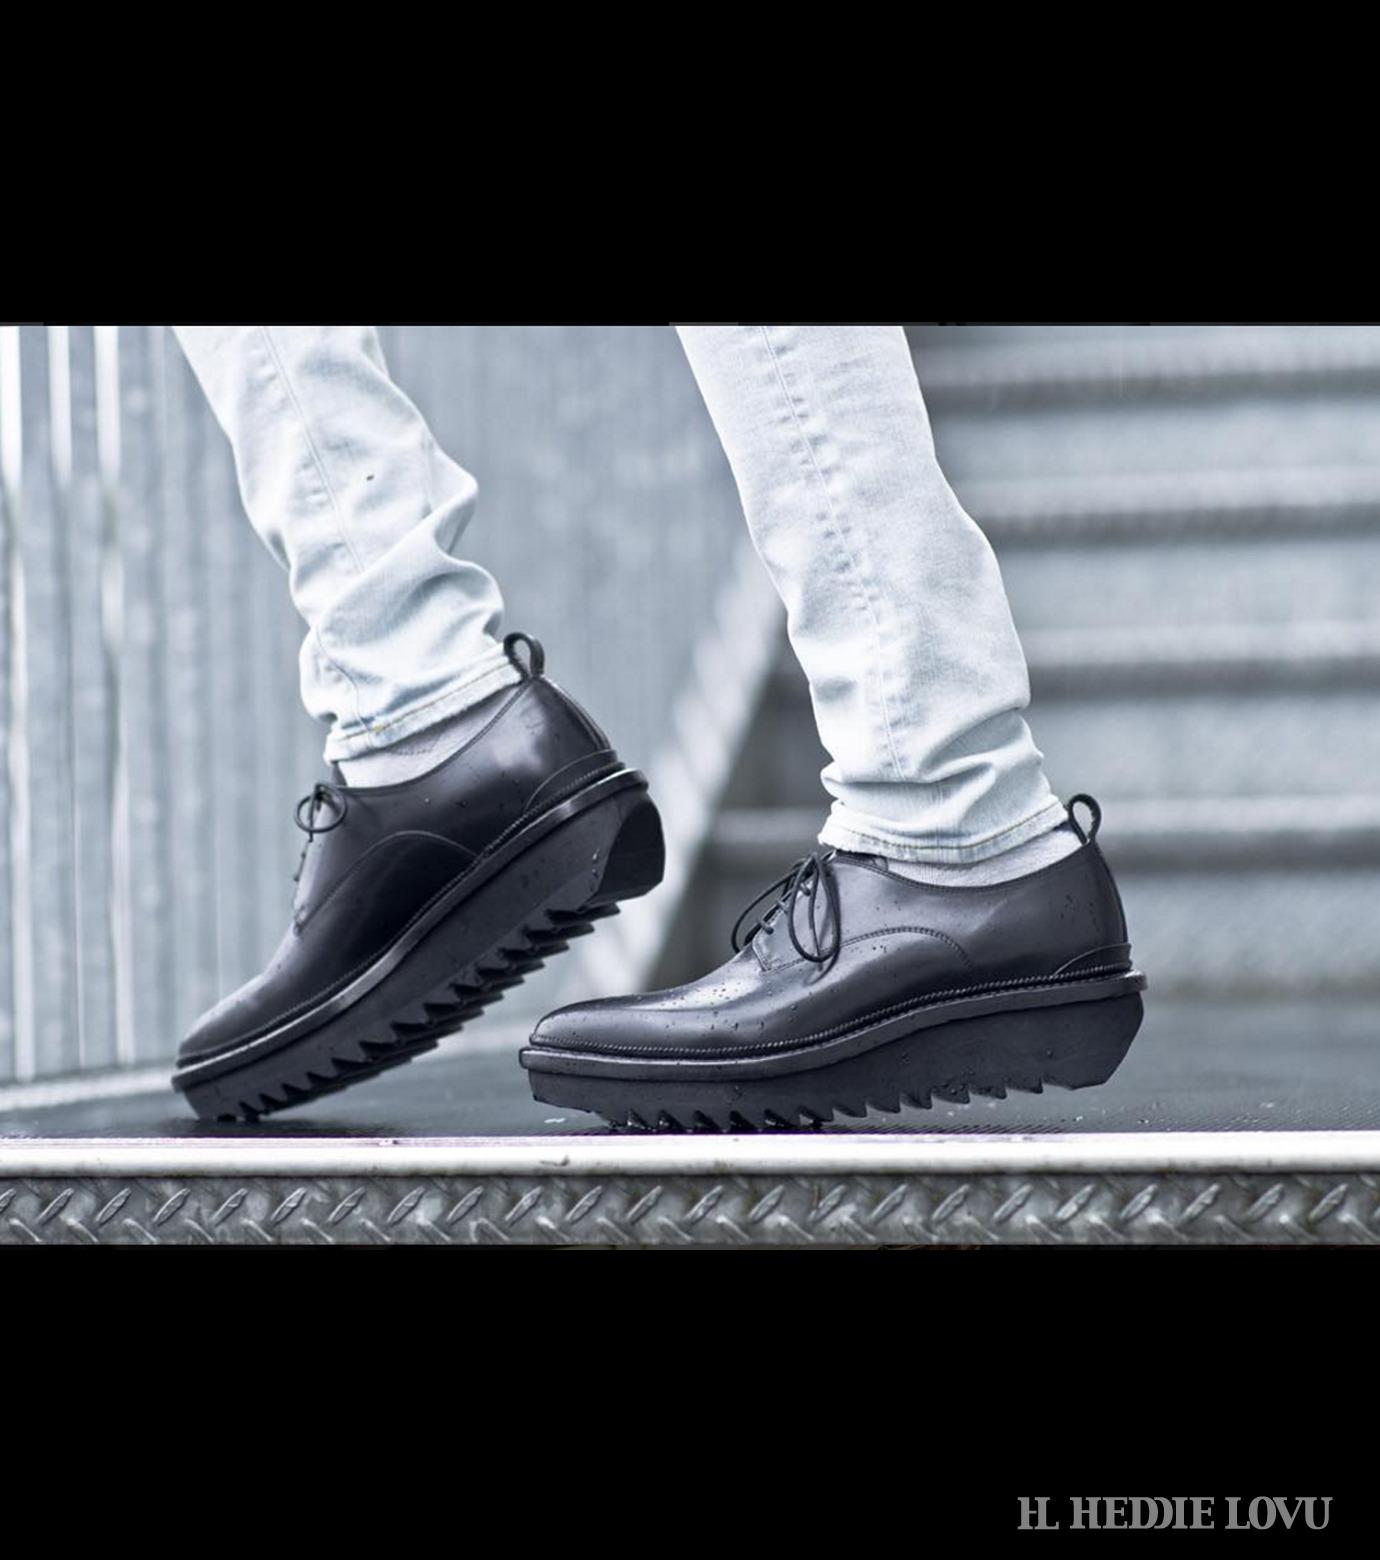 HL HEDDIE LOVU(エイチエル・エディールーヴ)のSHIRKSOLE SHOES-BLACK(シューズ/shoes)-18S90001-13 拡大詳細画像6